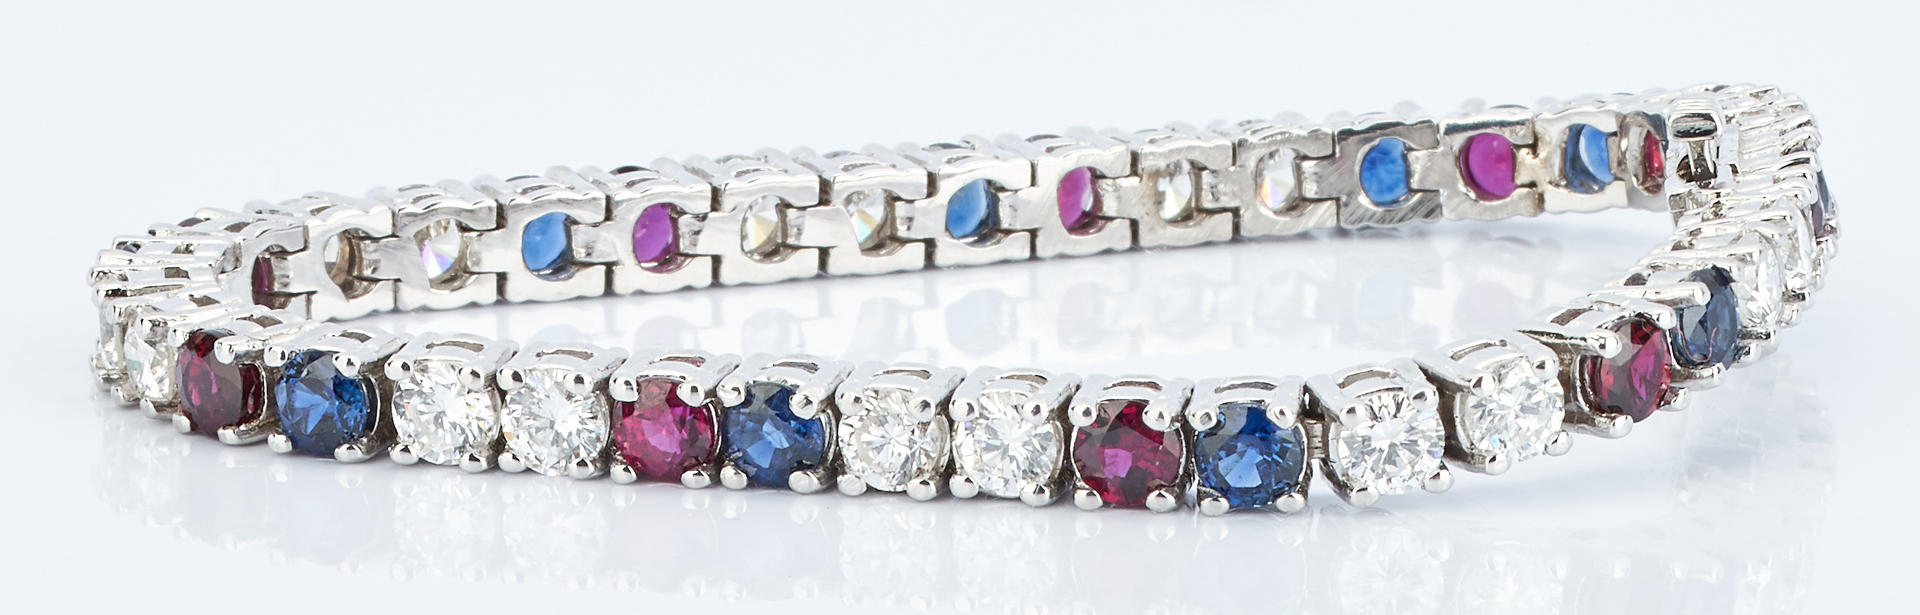 Lot 39: Diamond, Ruby, and Sapphire Tennis Bracelet